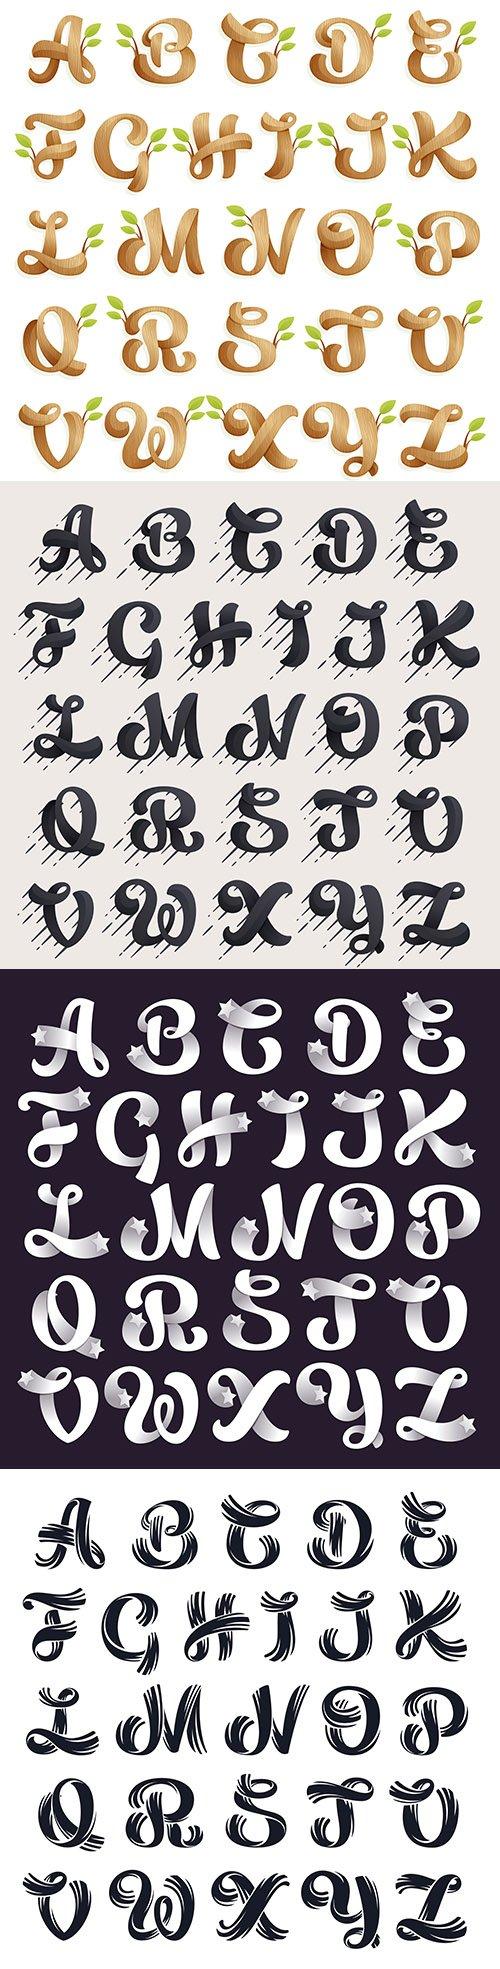 Alphabet decorative design to create logo and label